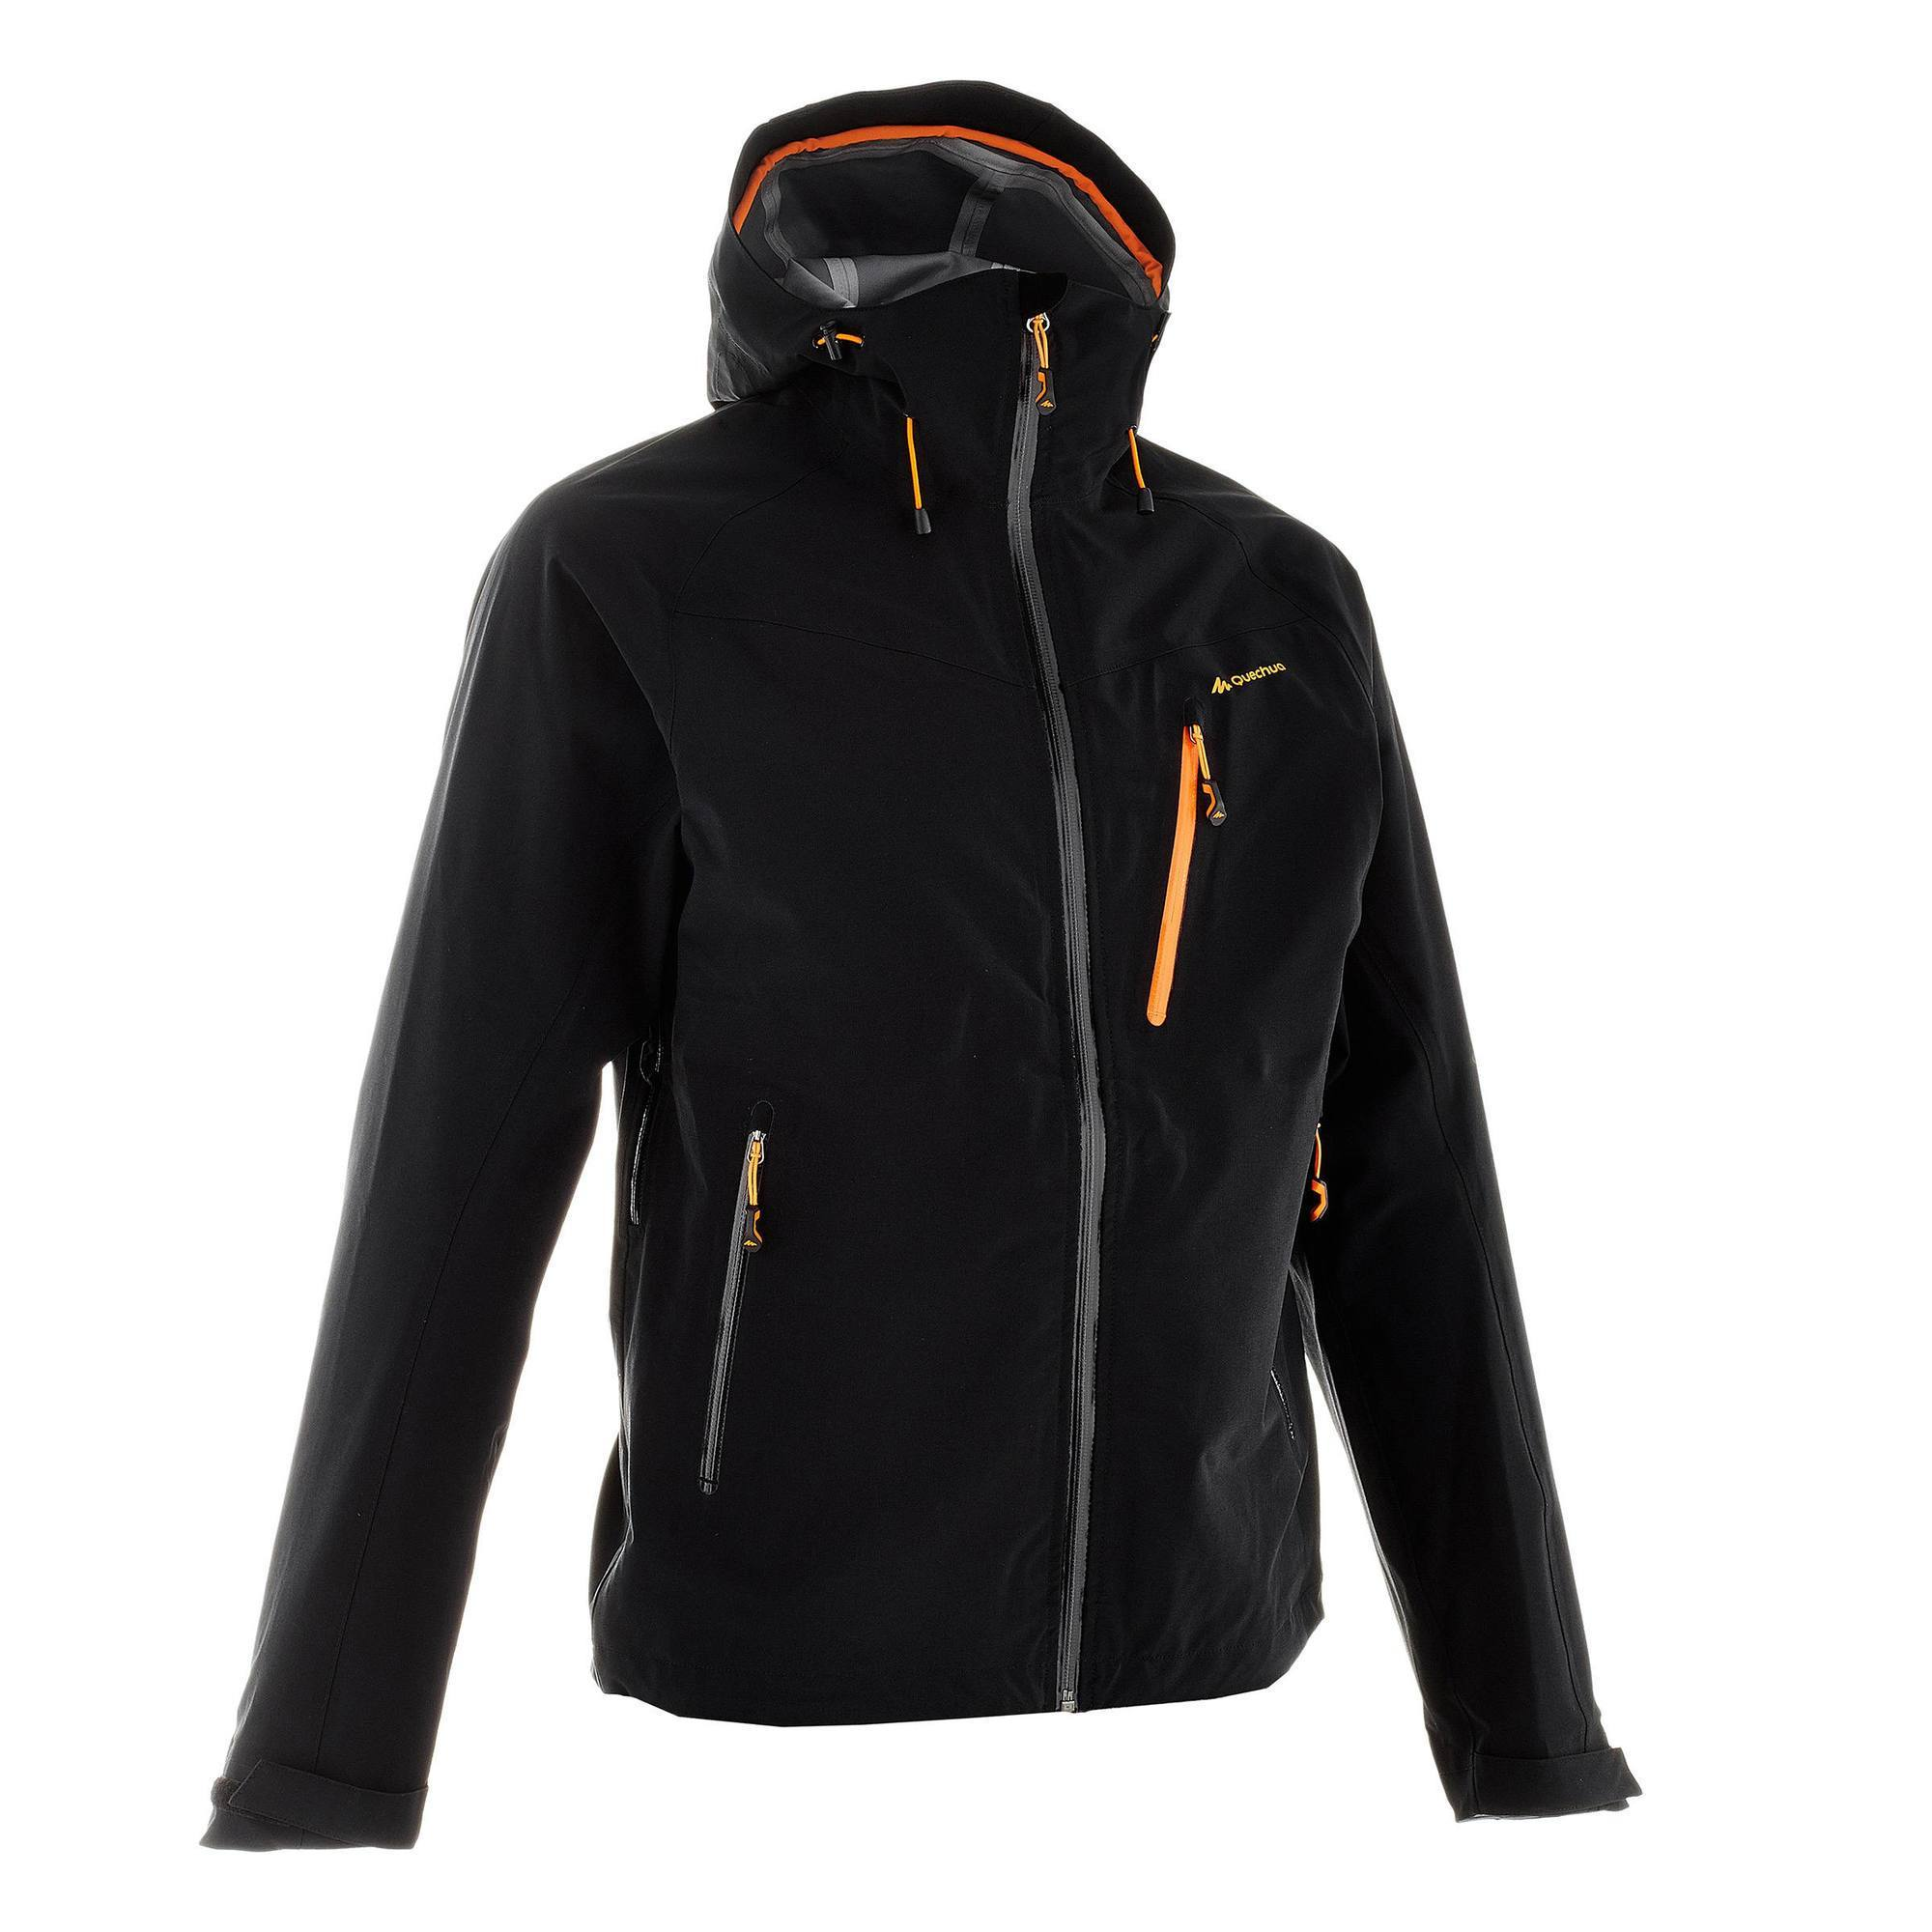 size 40 e0763 f2691 Test giacca Quechua Decathlon Forclaz 400 nera uomo - Slow ...